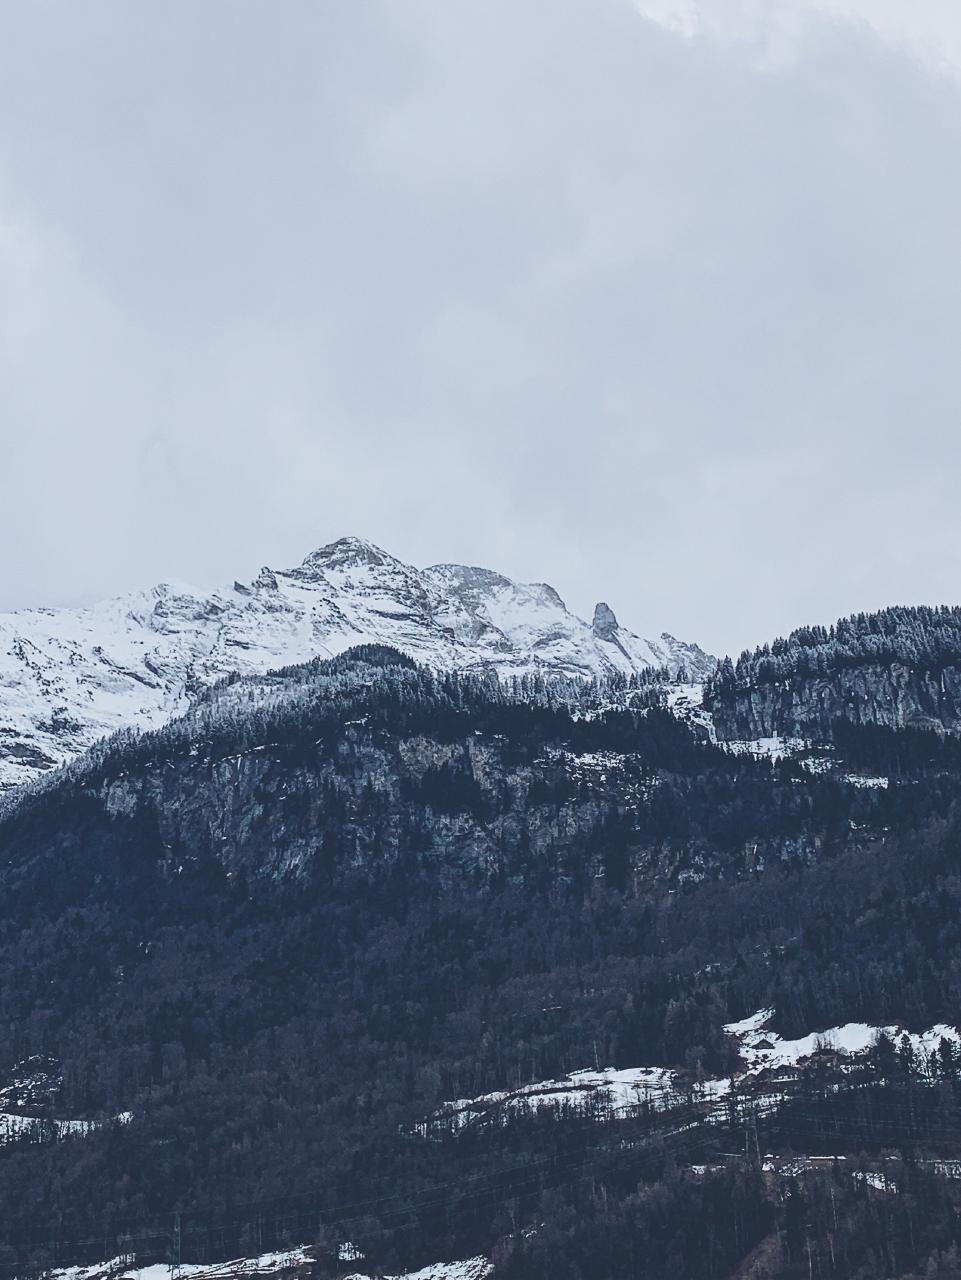 Ferienwohnung Mountain 4U (2605720), Meiringen, Meiringen - Hasliberg, Berner Oberland, Schweiz, Bild 21